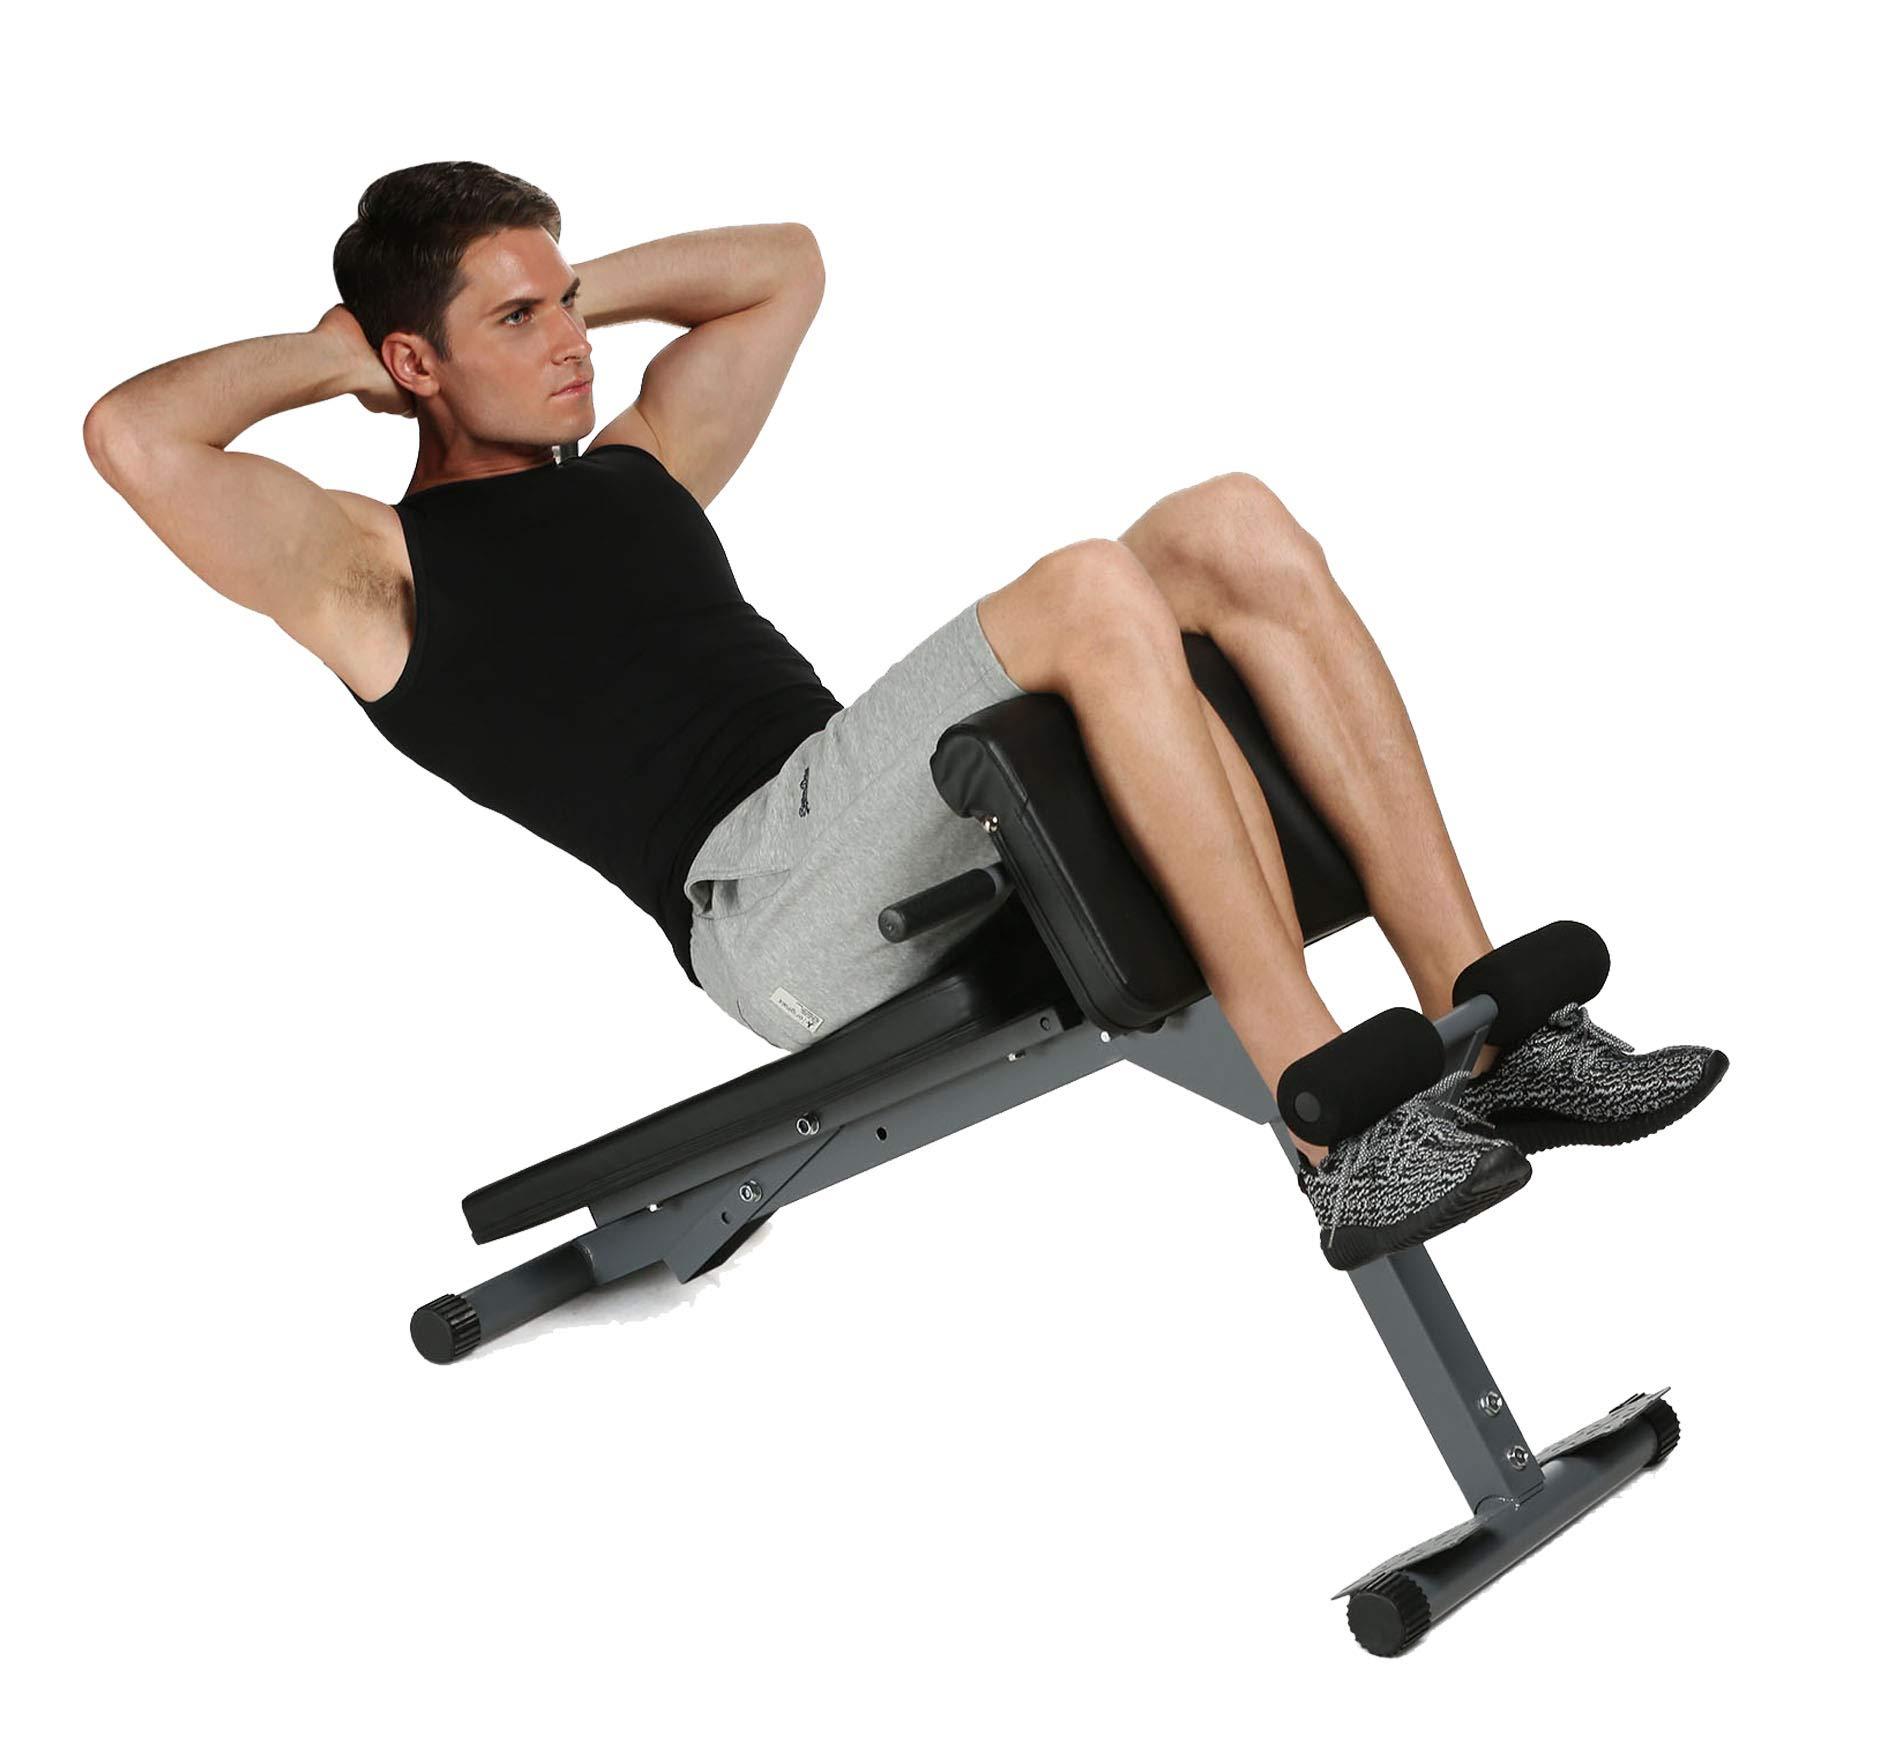 Jaketen Professional Sit Bench Adjustable